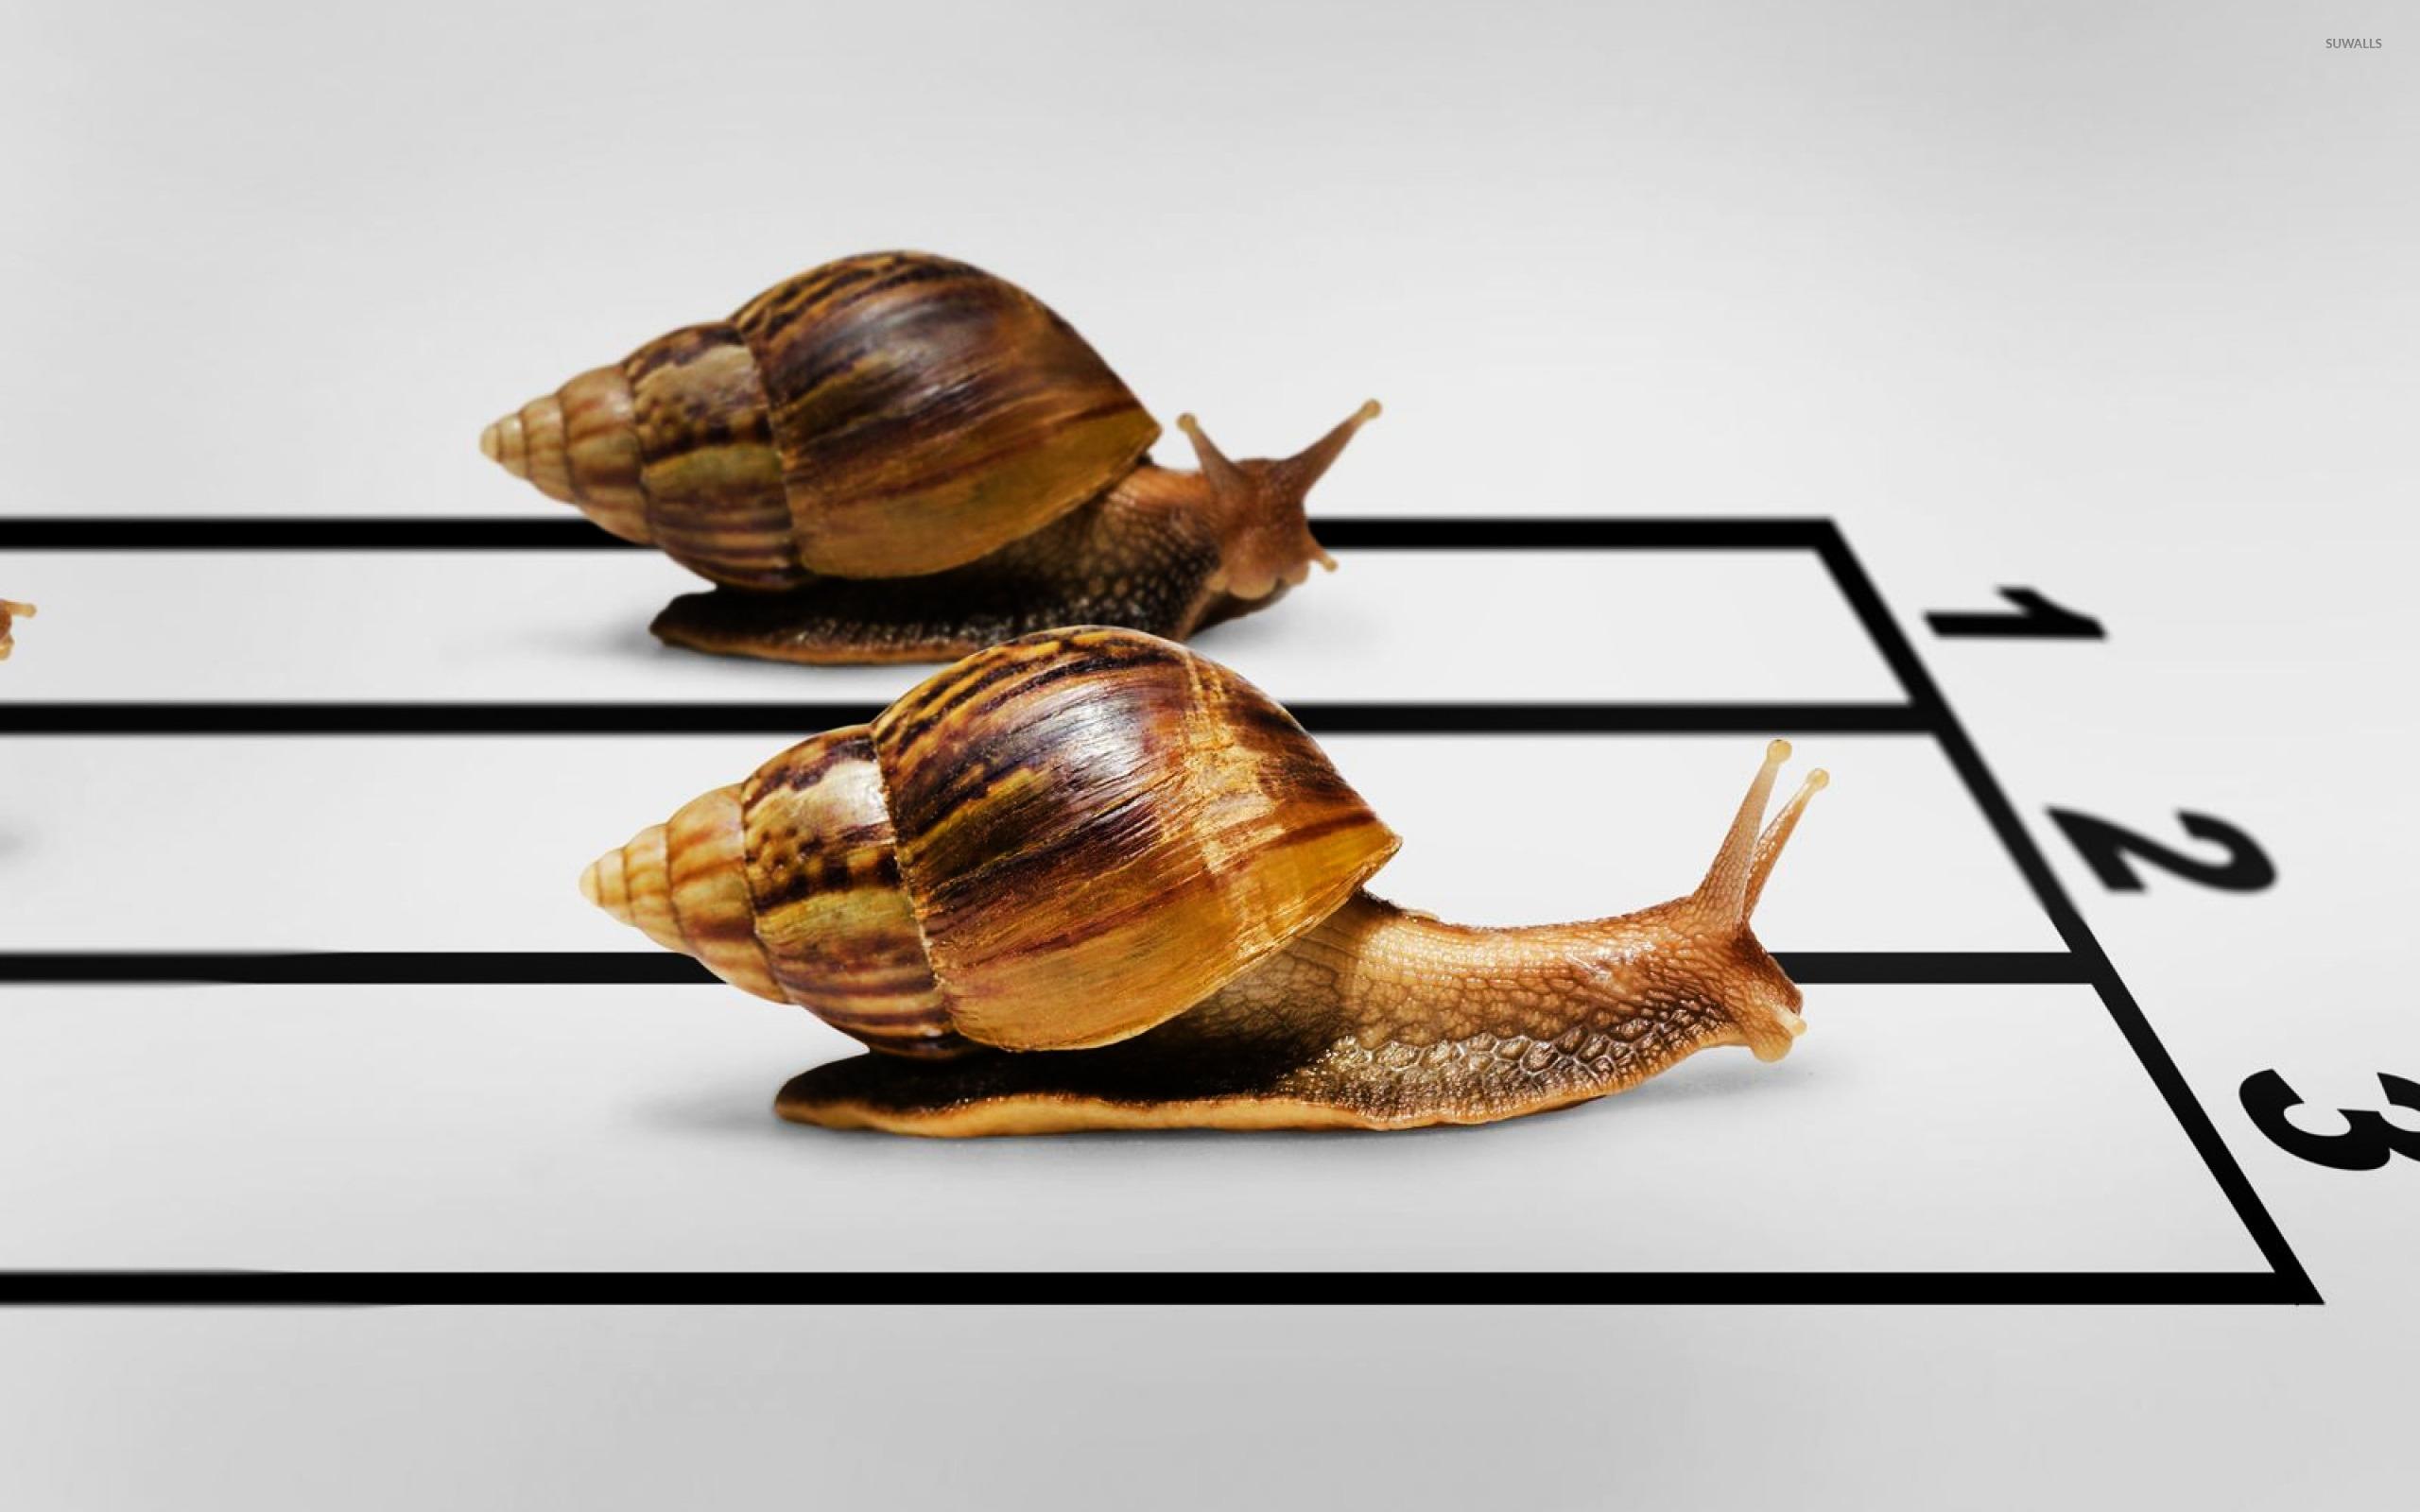 snail race 2 wallpaper   animal wallpapers   22789